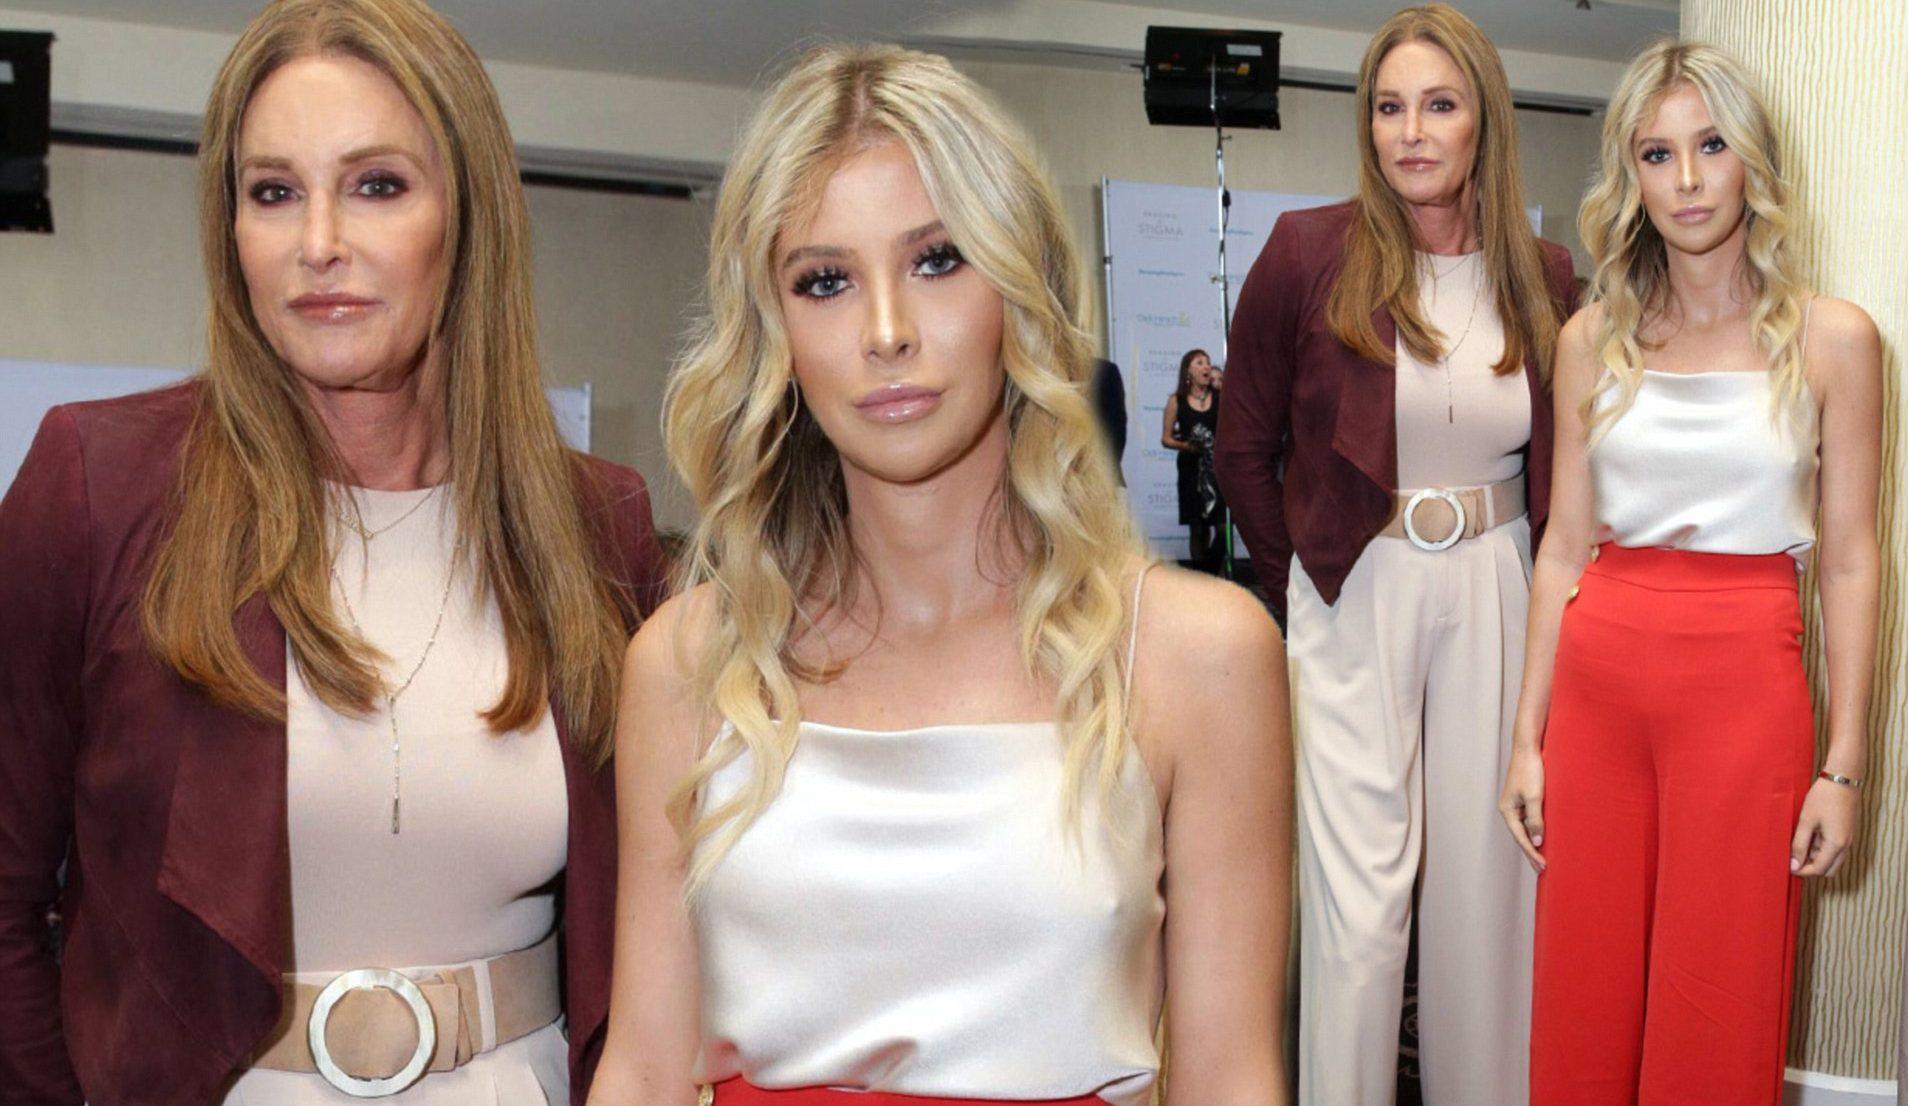 Caitlyn Jenner'in Trans Model Sophia Hutchins'le Evlenmeyi Planladığı İddia Edildi